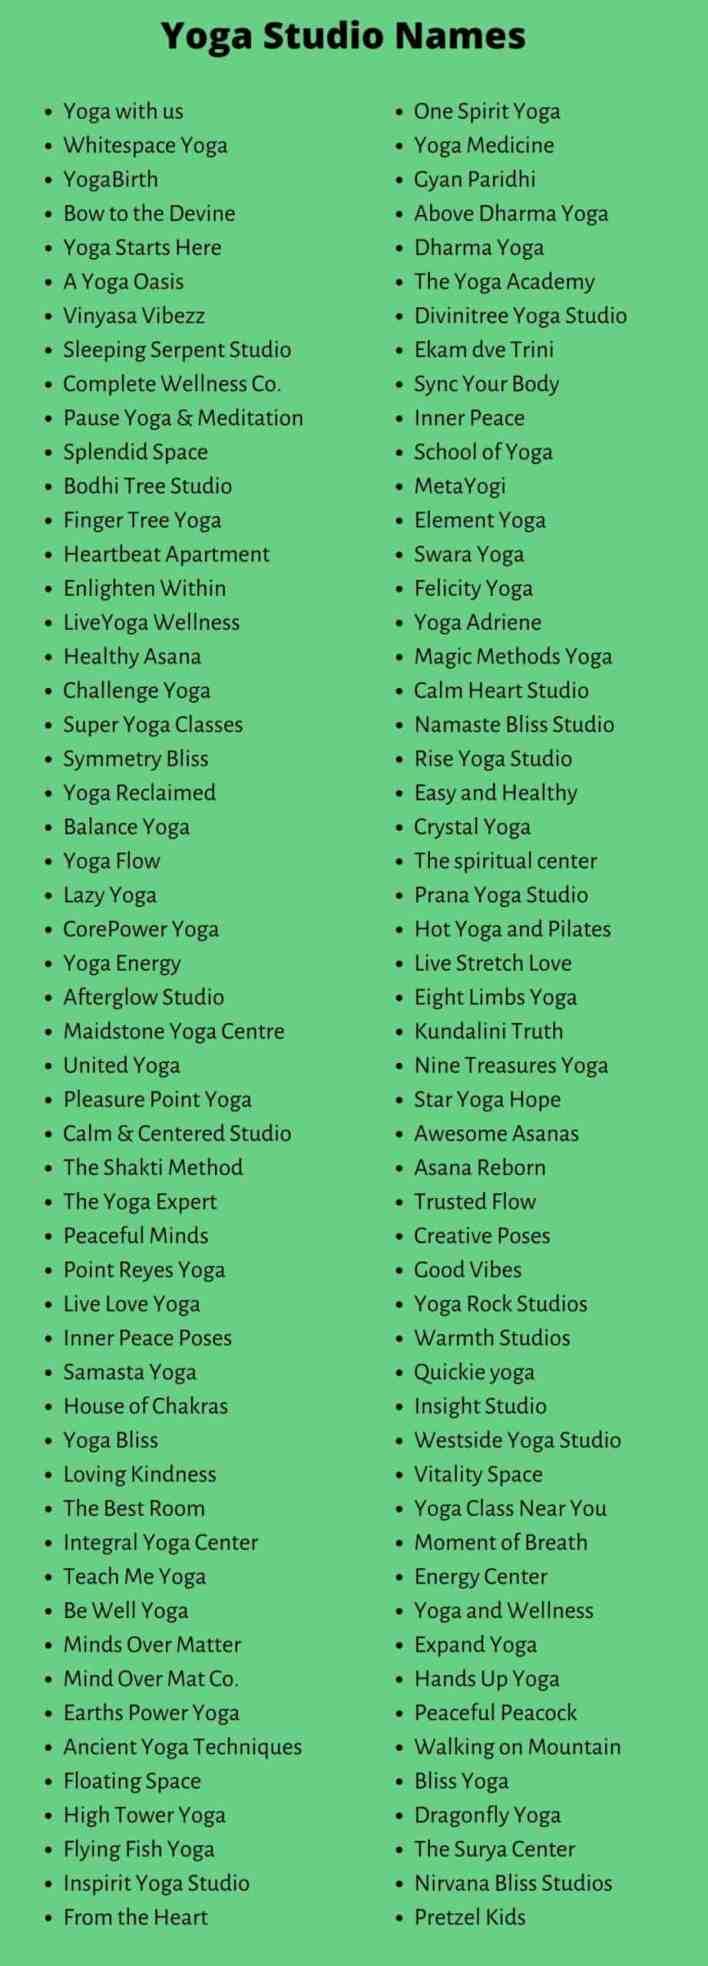 Yoga Studio Names